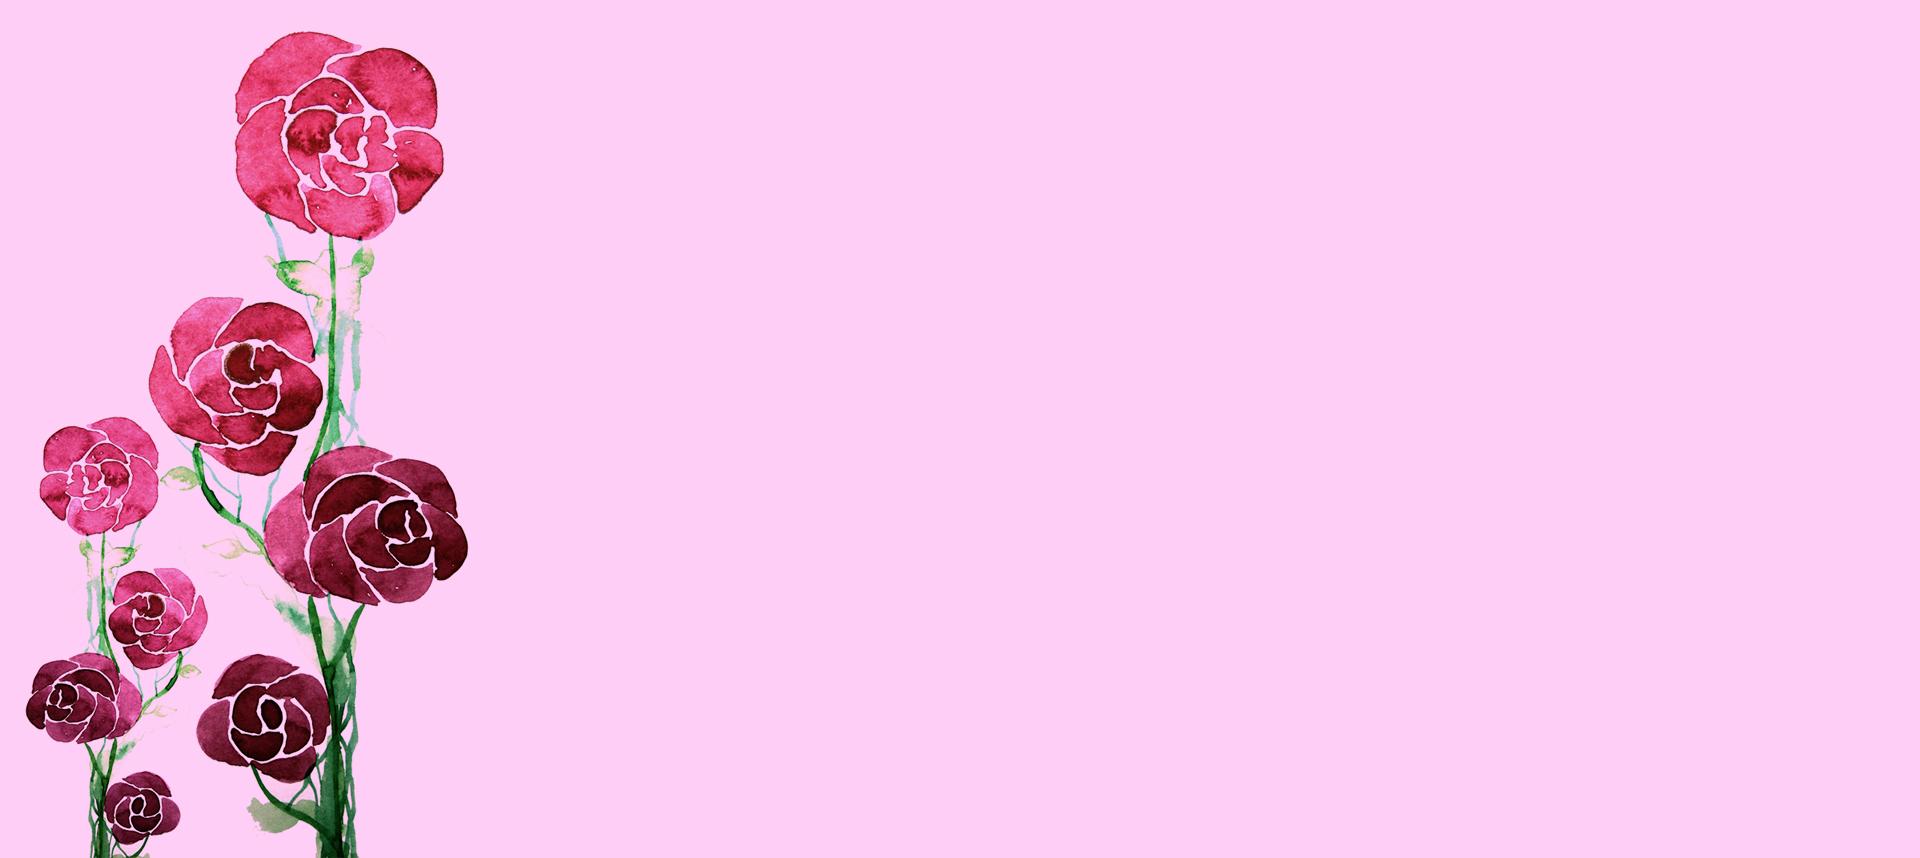 buket bunga ros latar belakang rose merah jambu segar imej